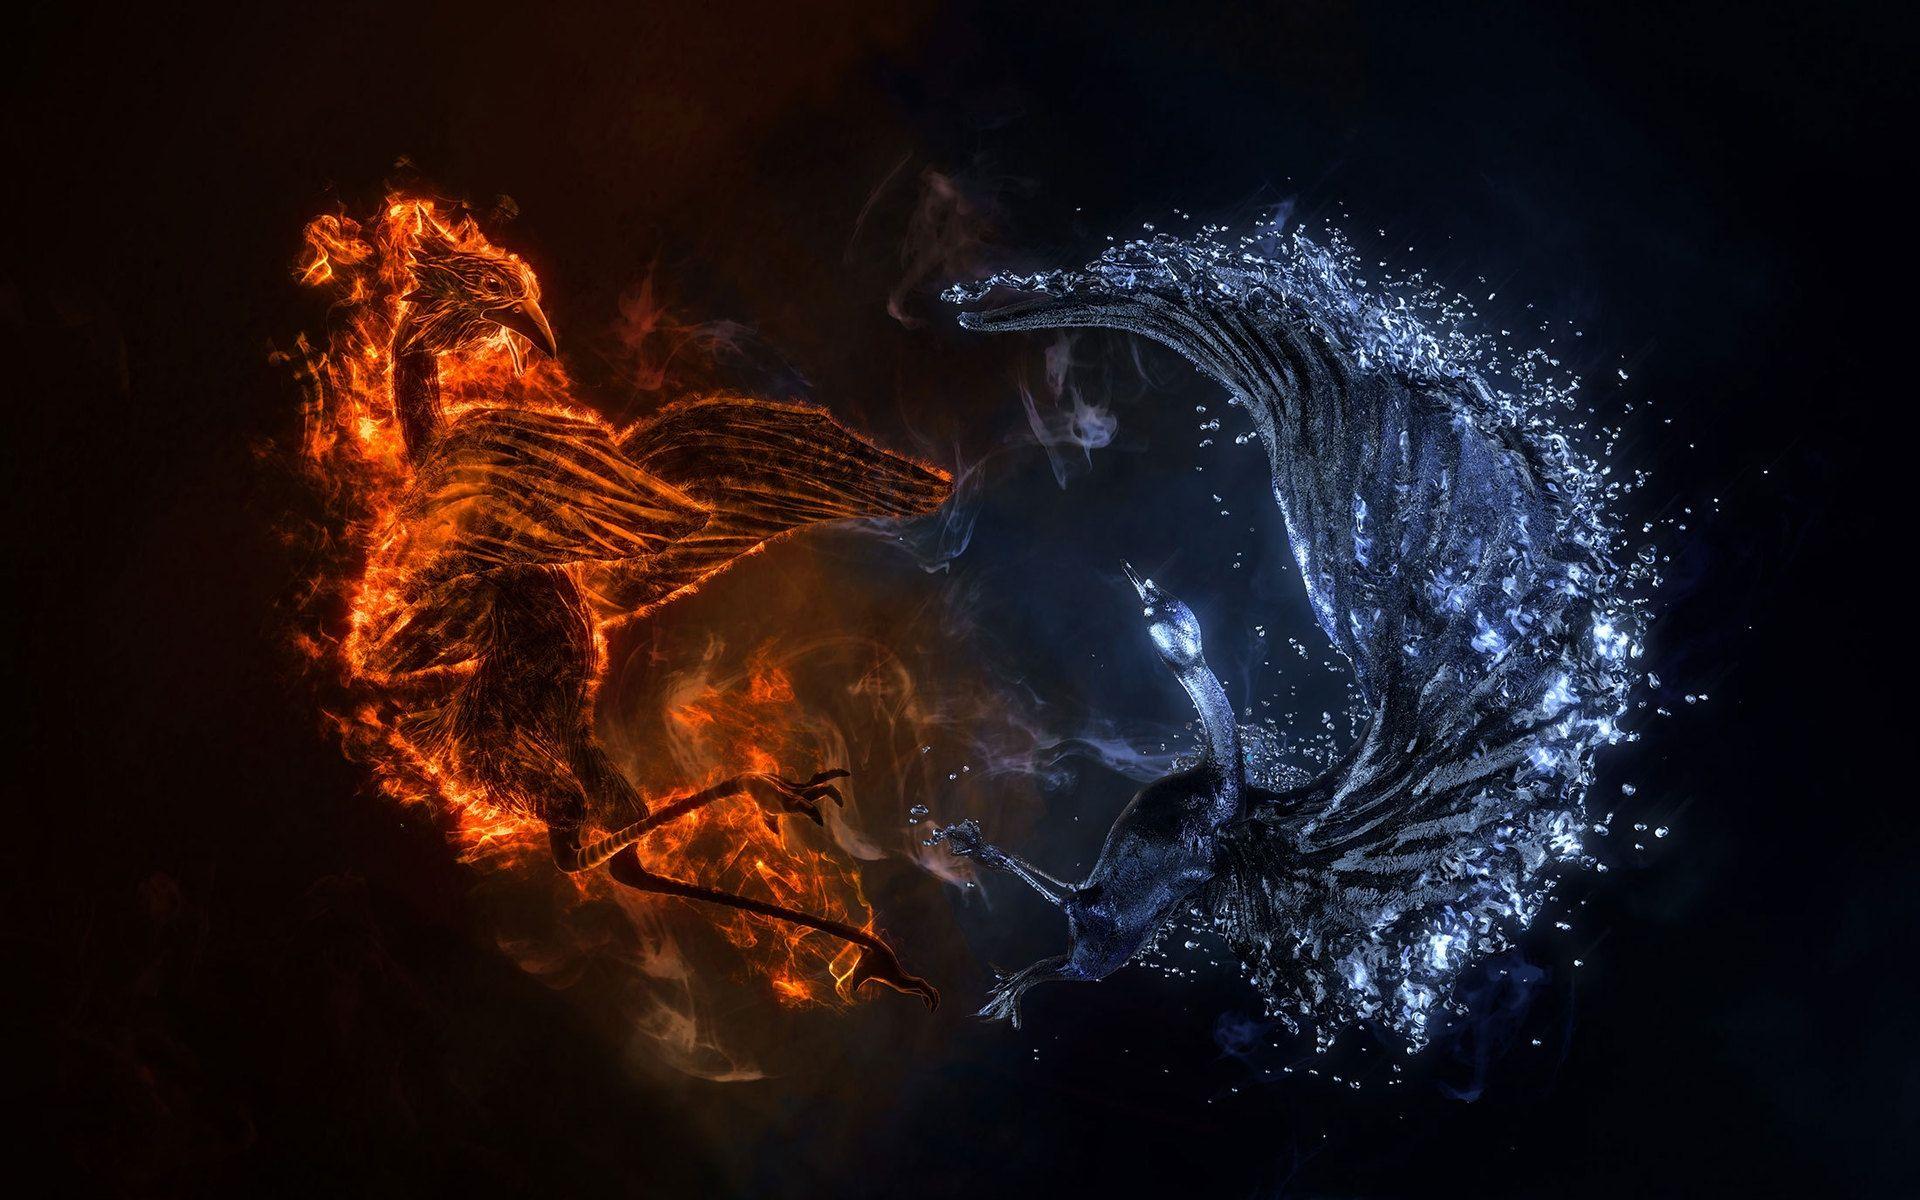 Fire And Water Wallpaper Phoenix Wallpaper Fire Art Water Art 1080p fire and water wallpaper hd